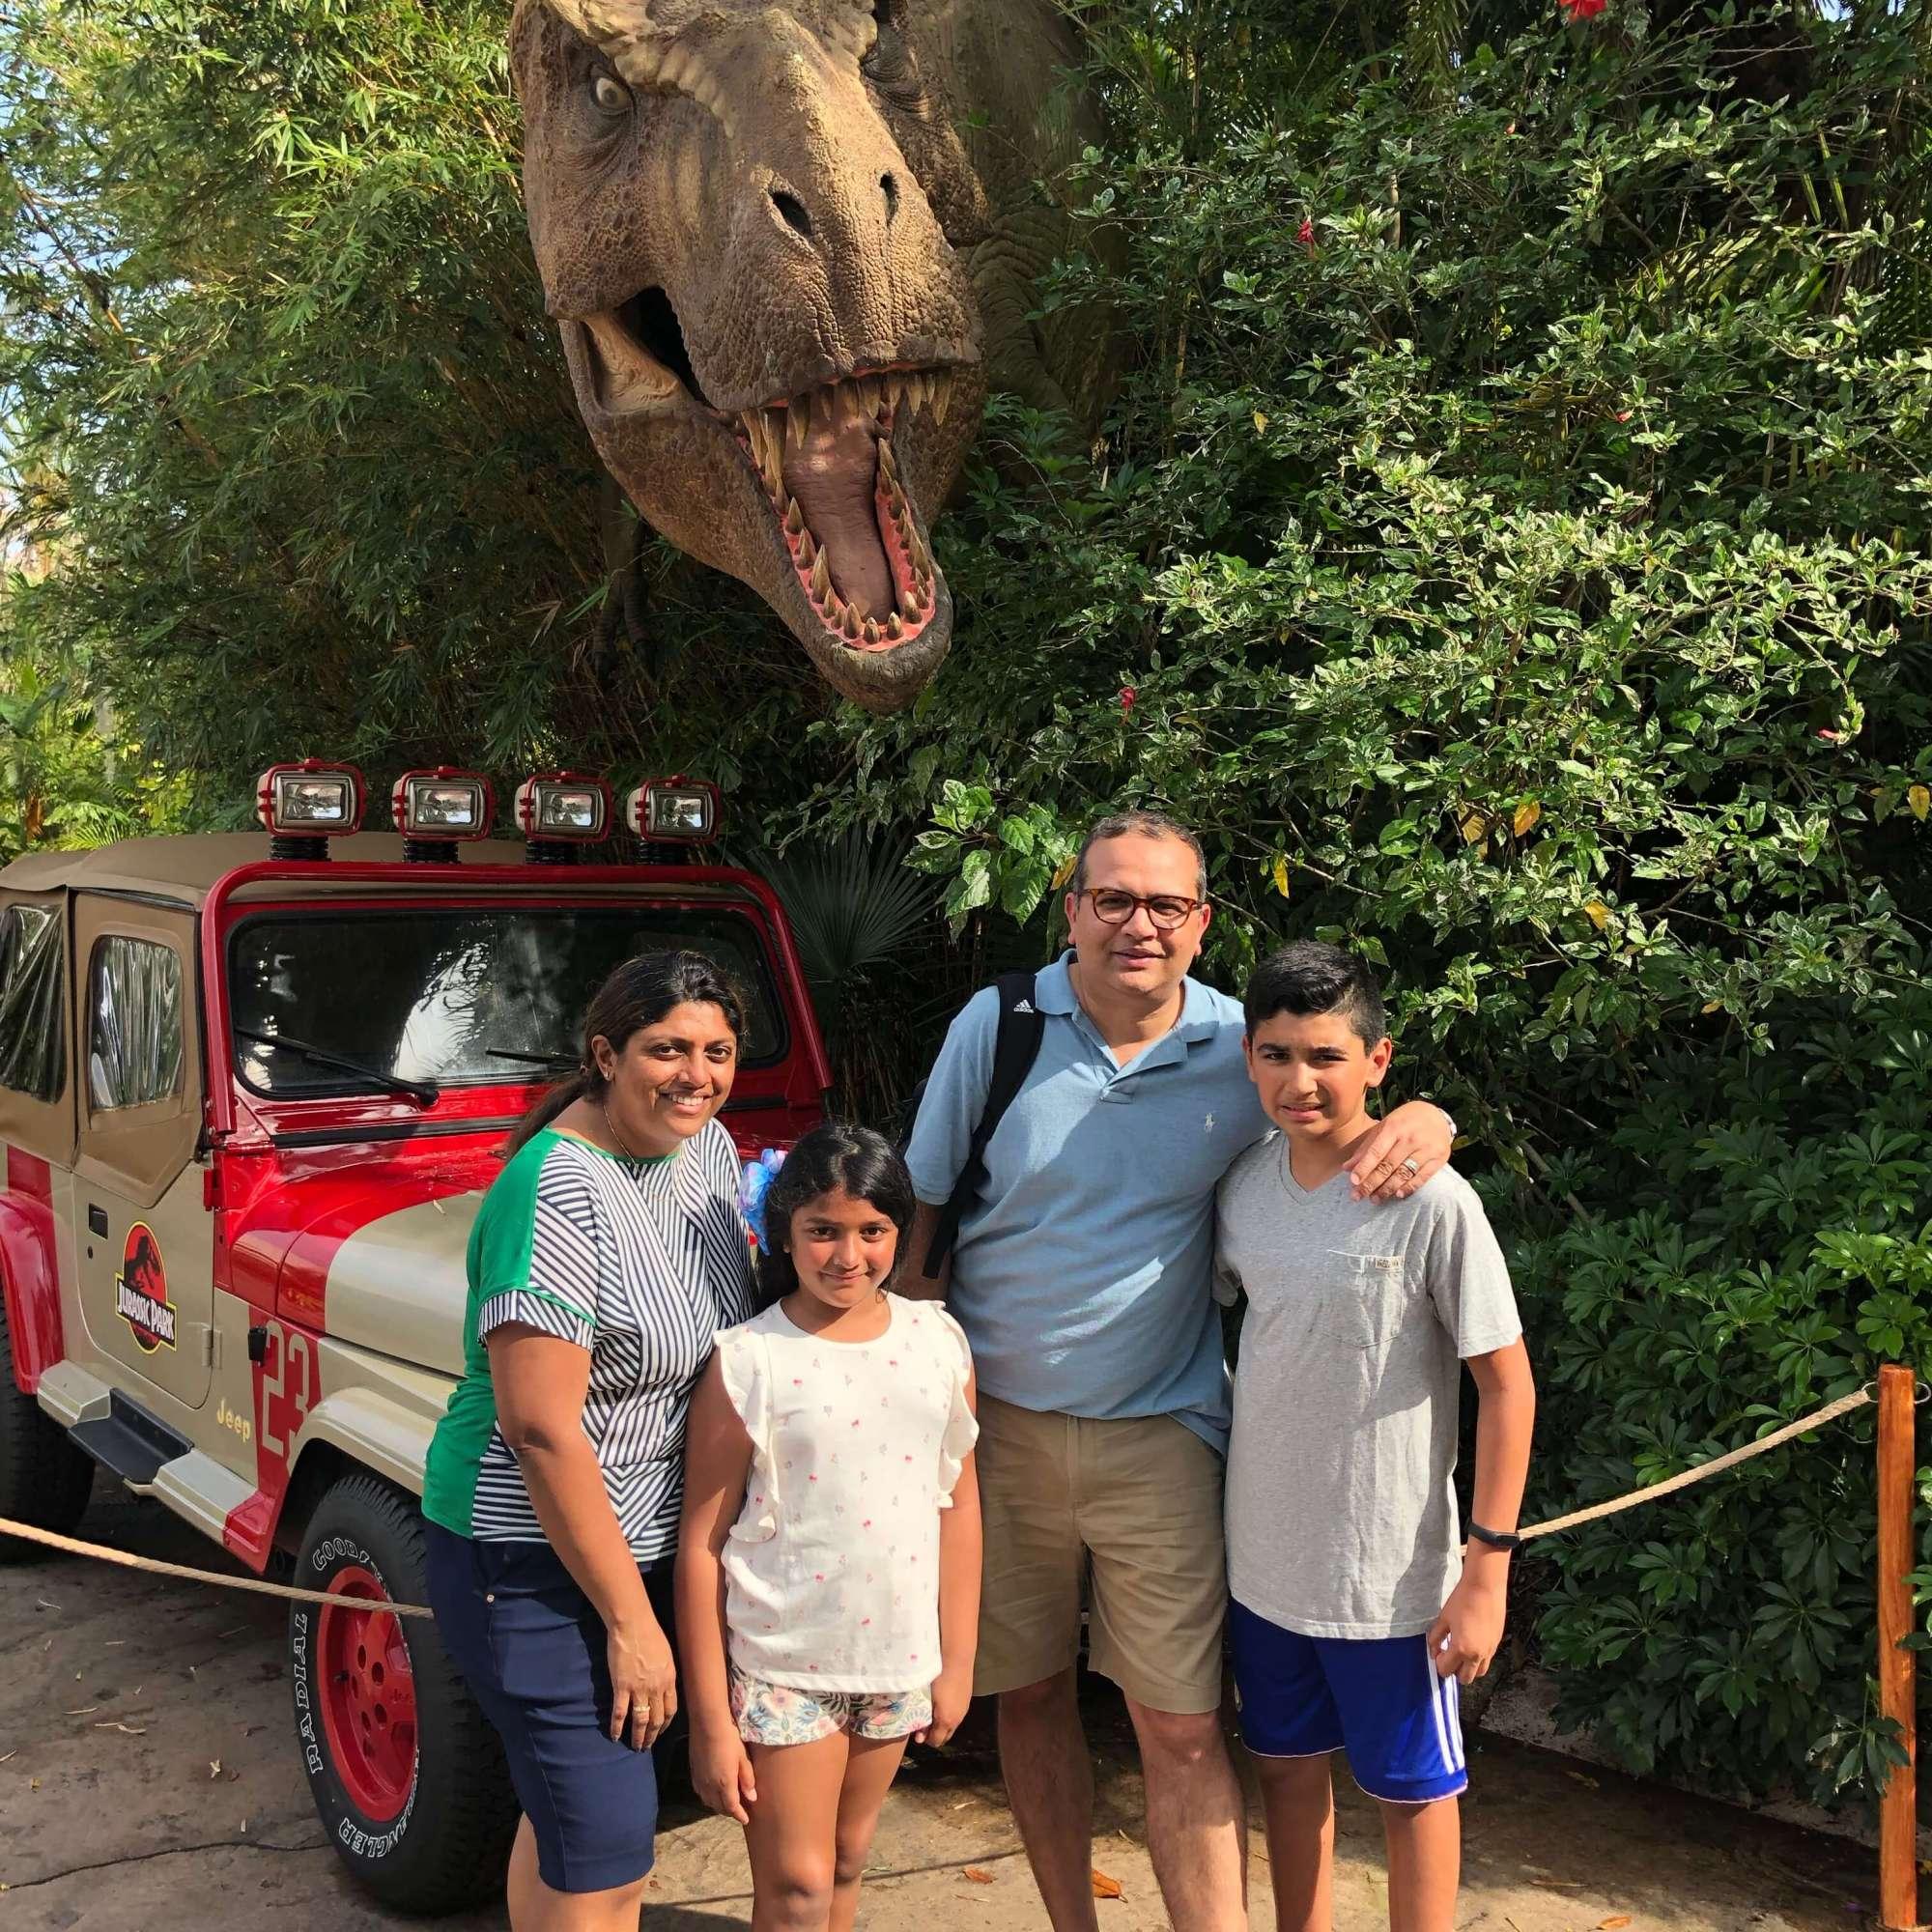 Disneyland first time - Best time to visit Disneyland